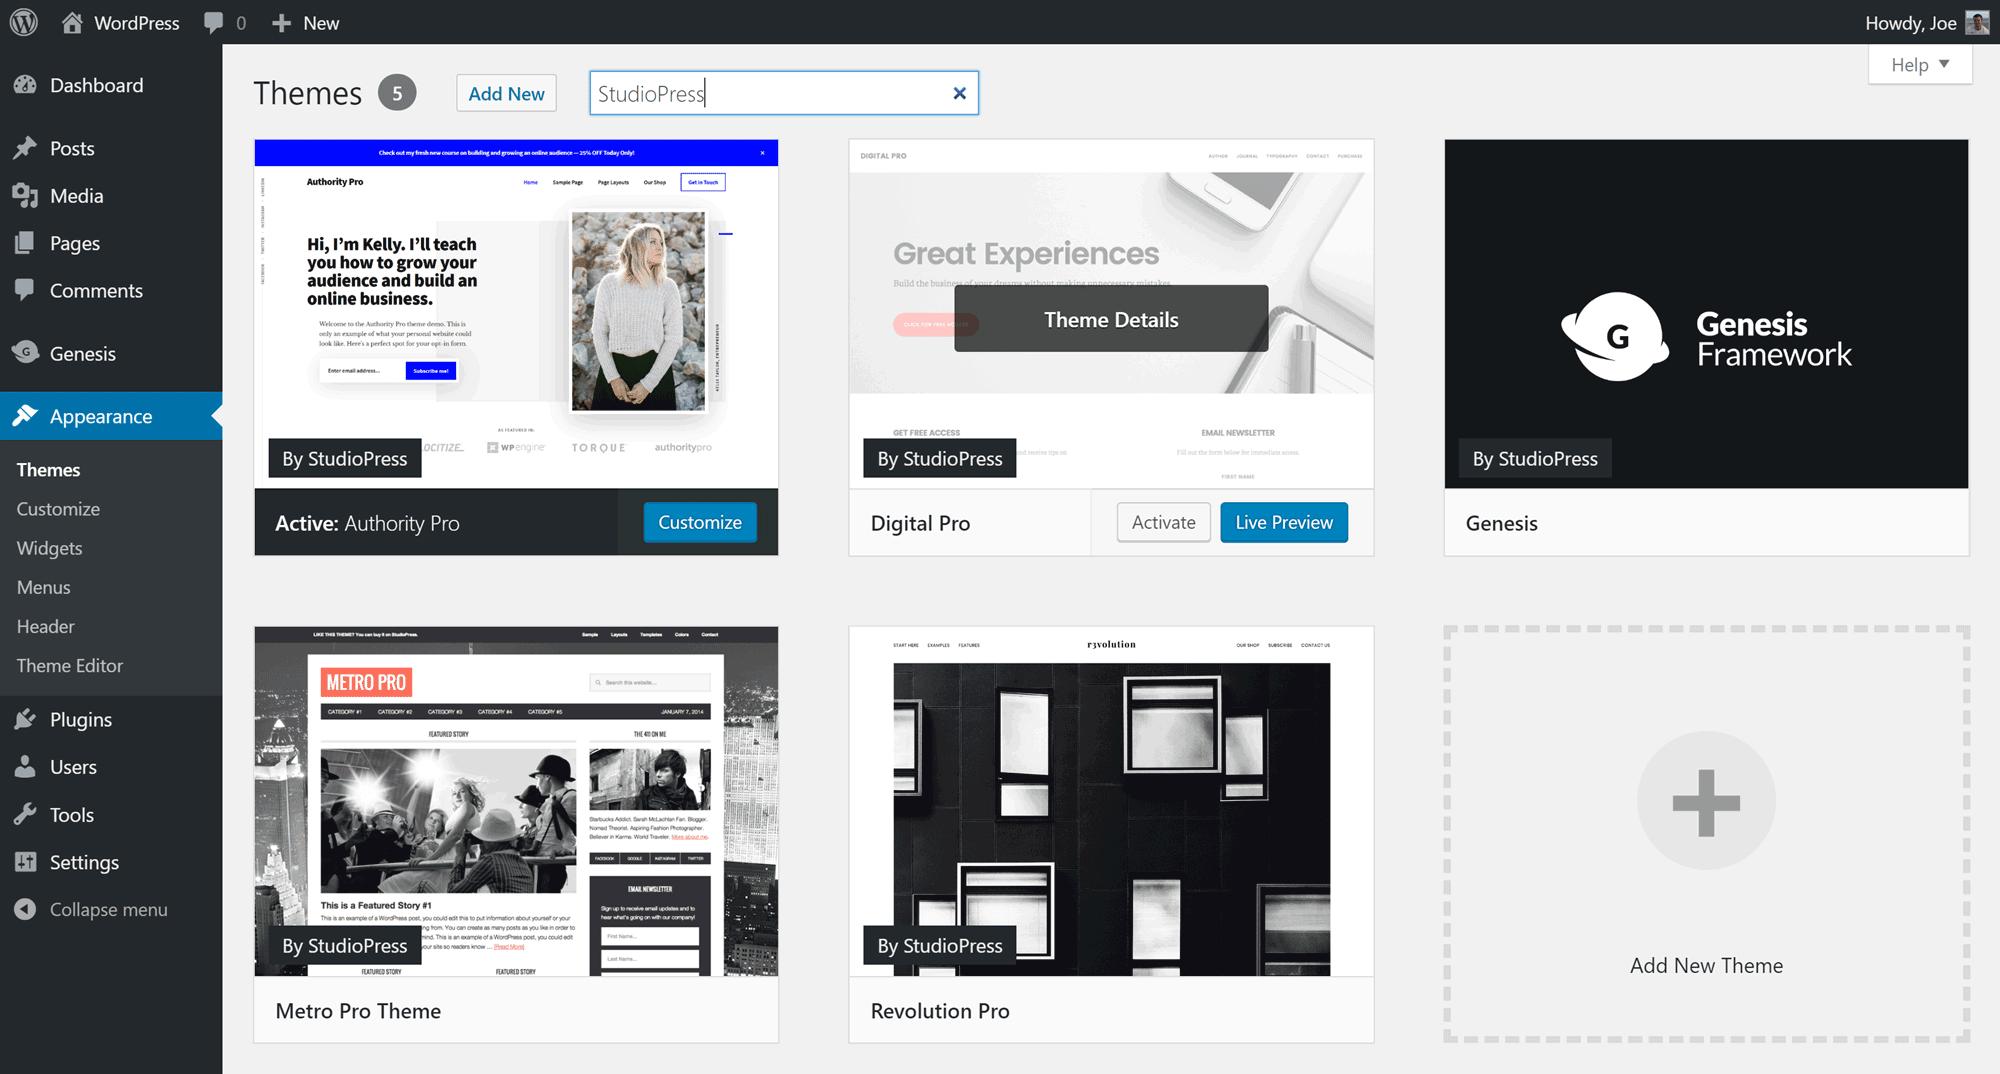 studiopress, herramientas para vlogueros, empezar un blog, wordpress